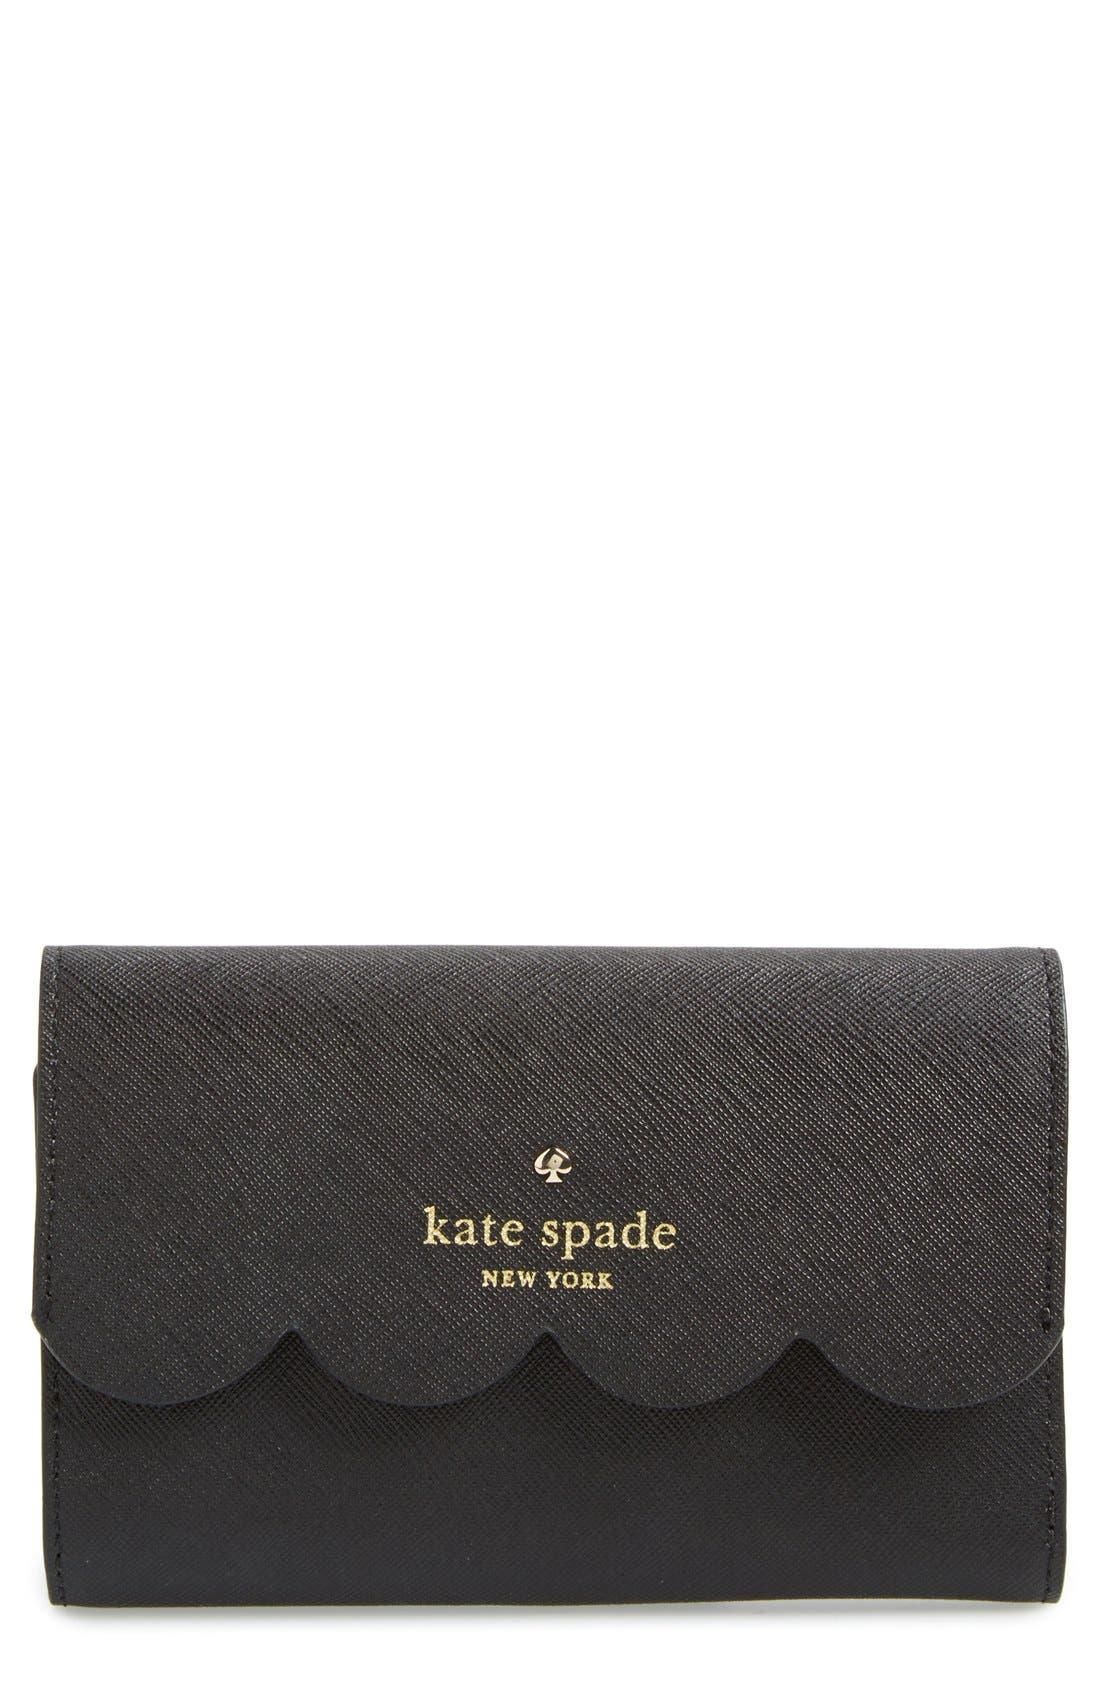 Main Image - kate spade new york 'lily avenue - kieran' wallet